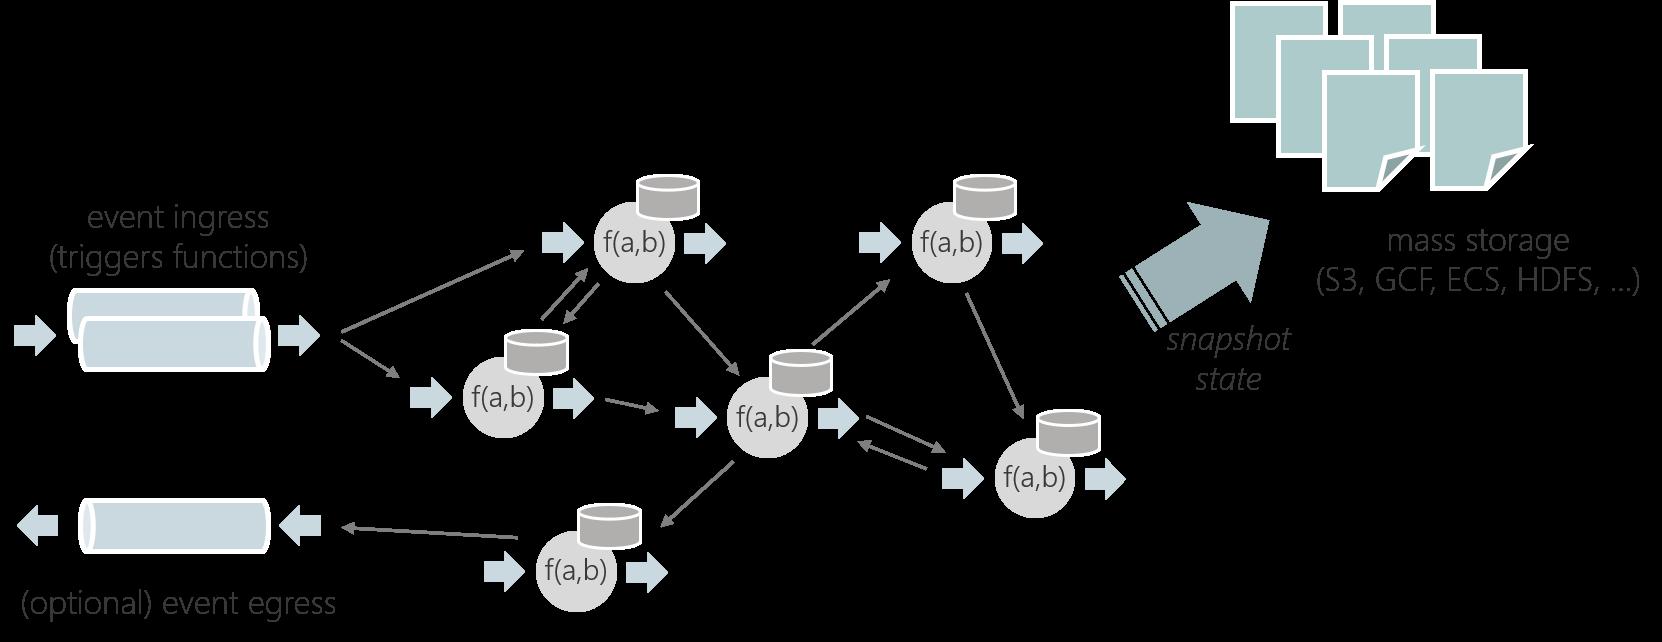 Stateful Functions开源:集成了Flink和FaaS的流处理优点